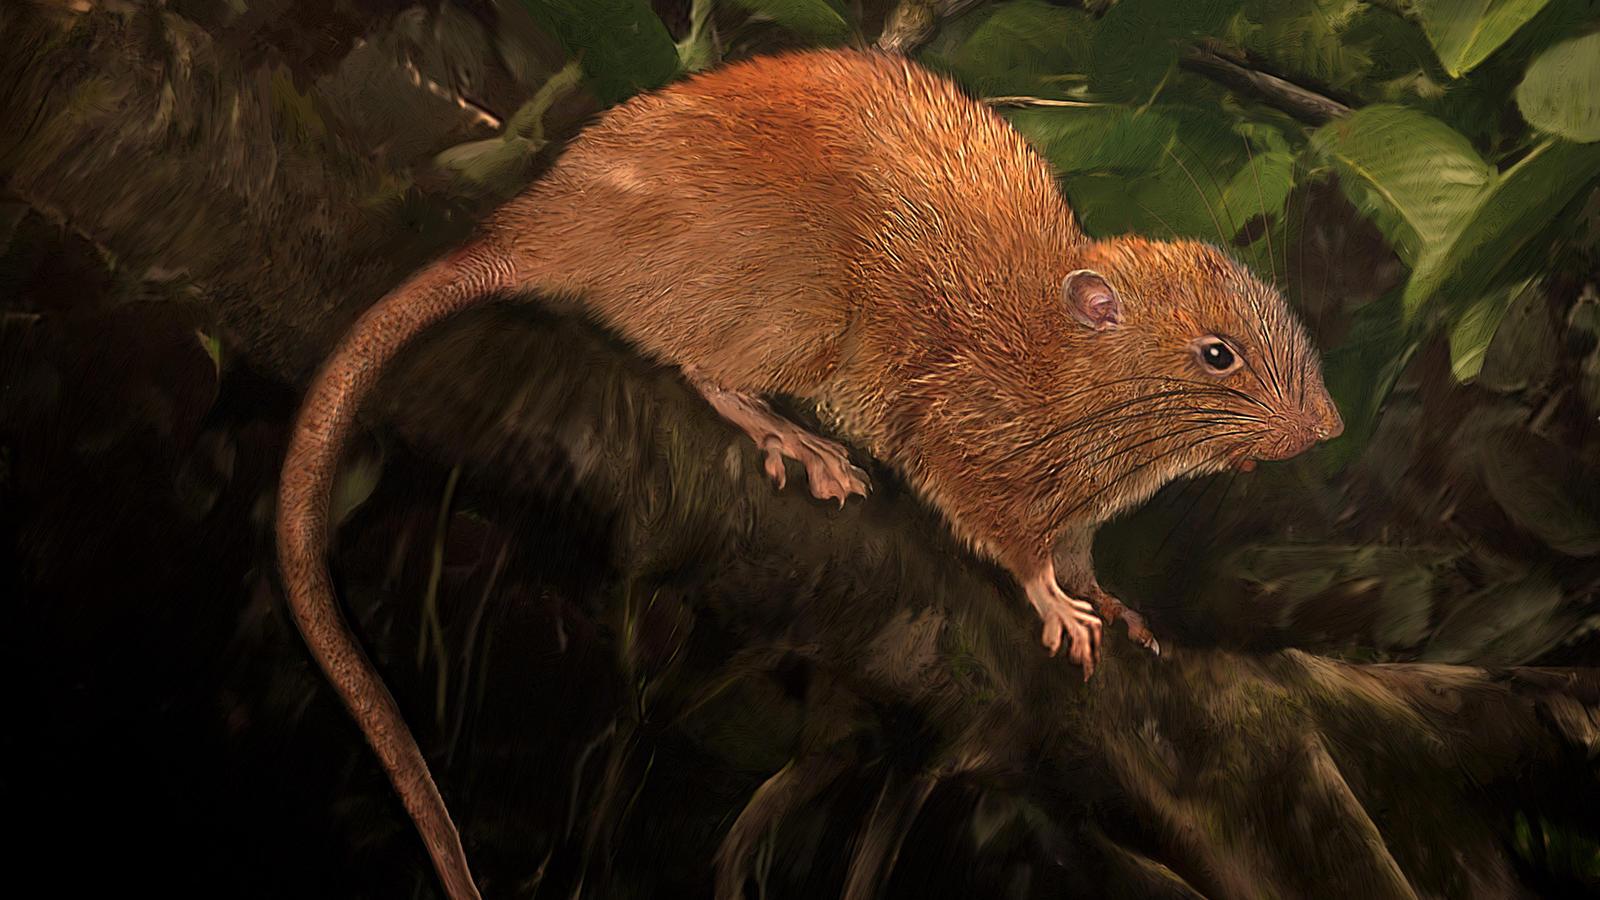 Uromys Vika Neue Riesige Rattenart Entdeckt Wetterde